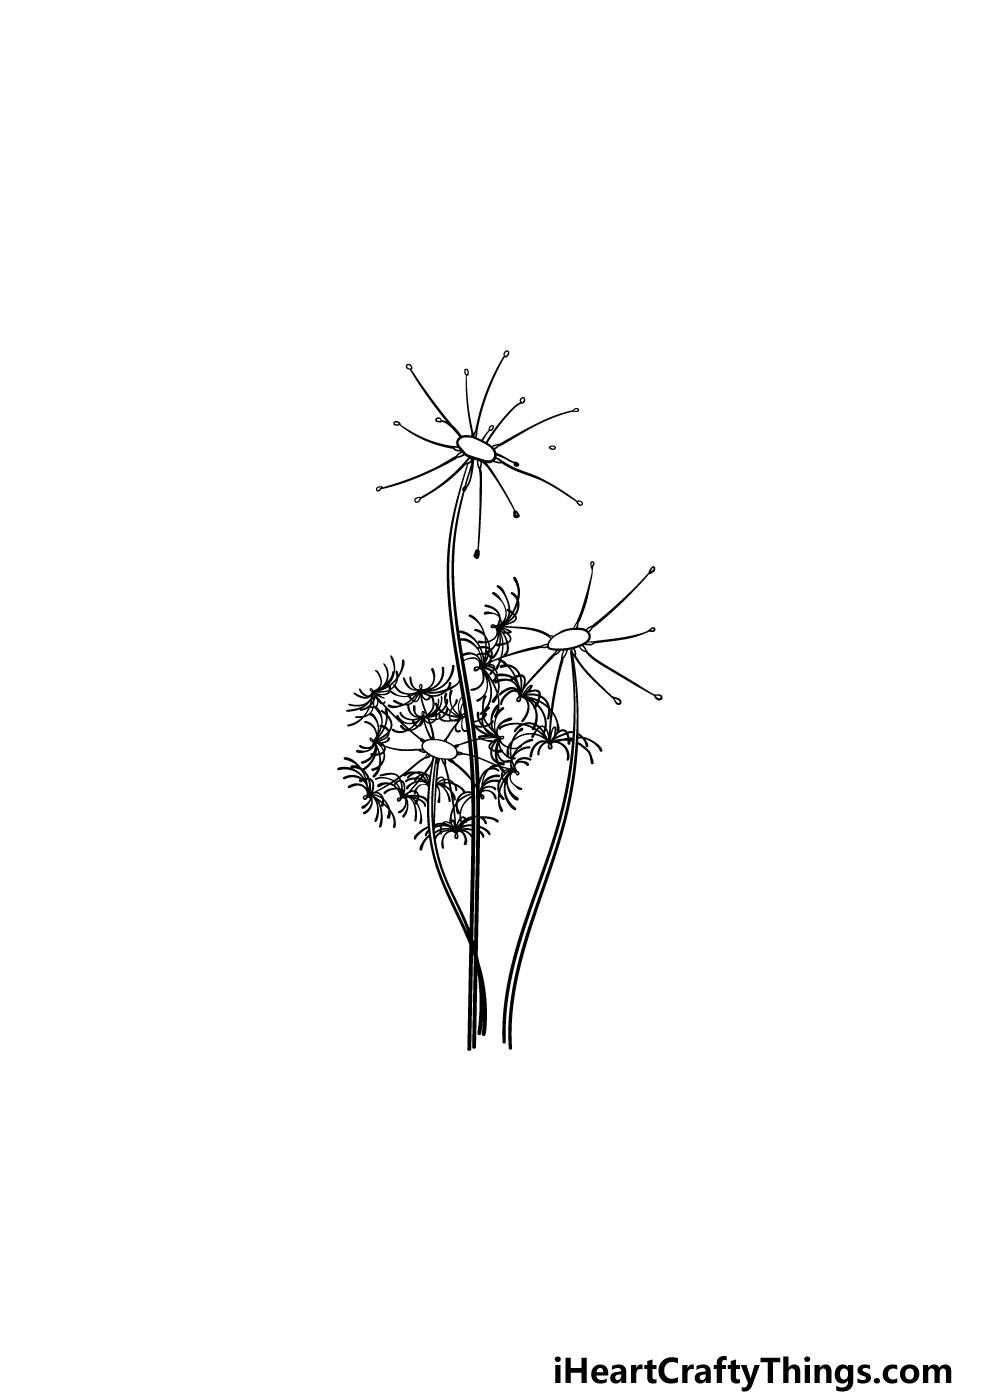 drawing a dandelion step 4